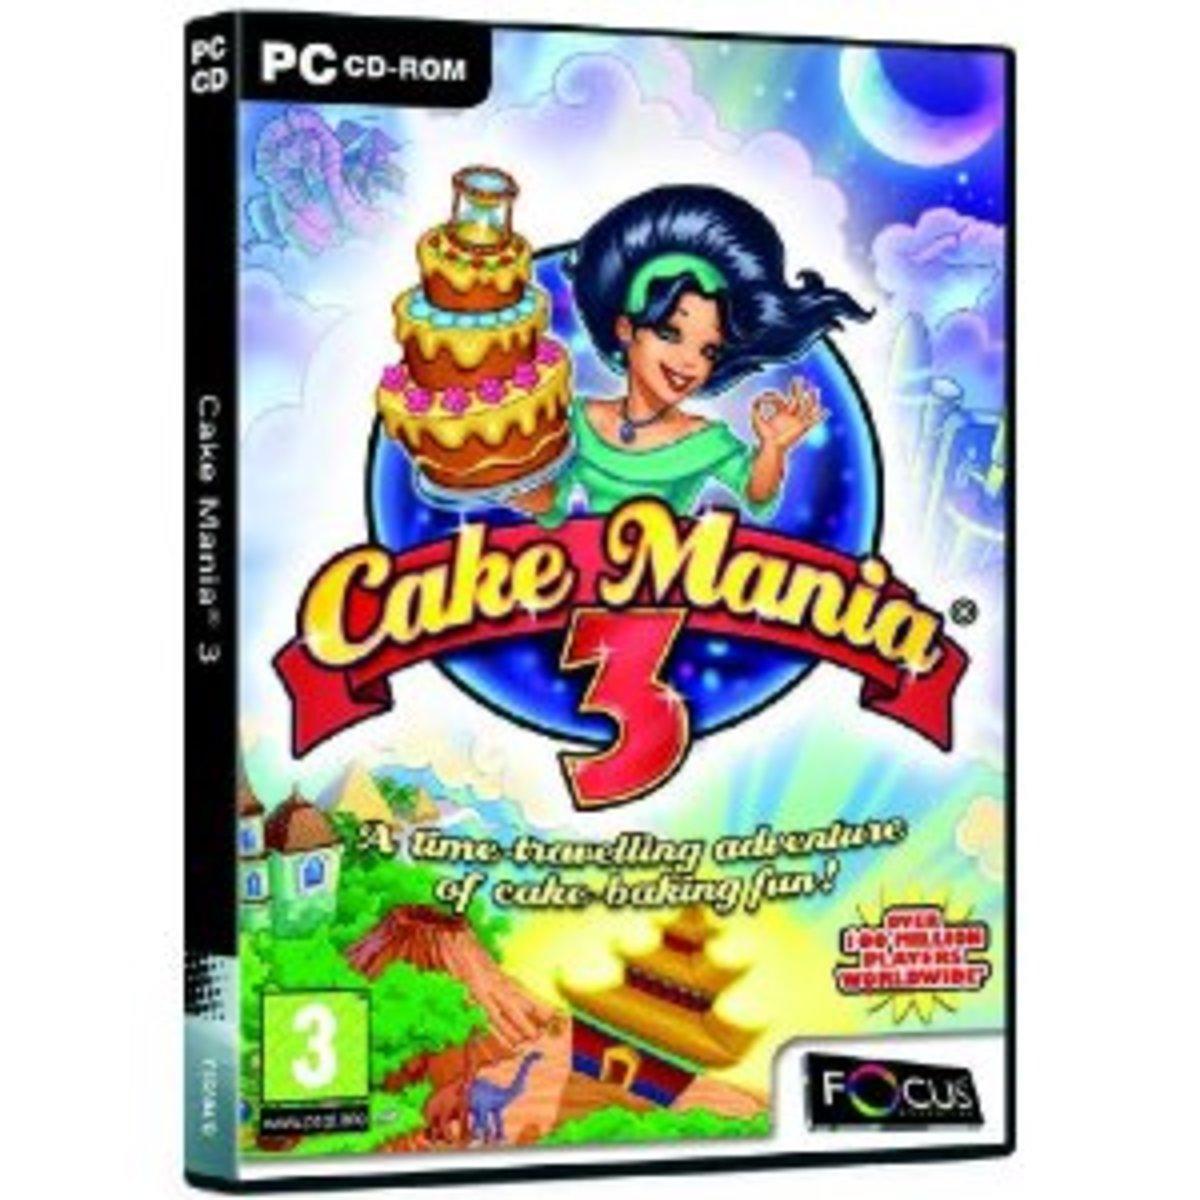 Cake Mania 3 game cover